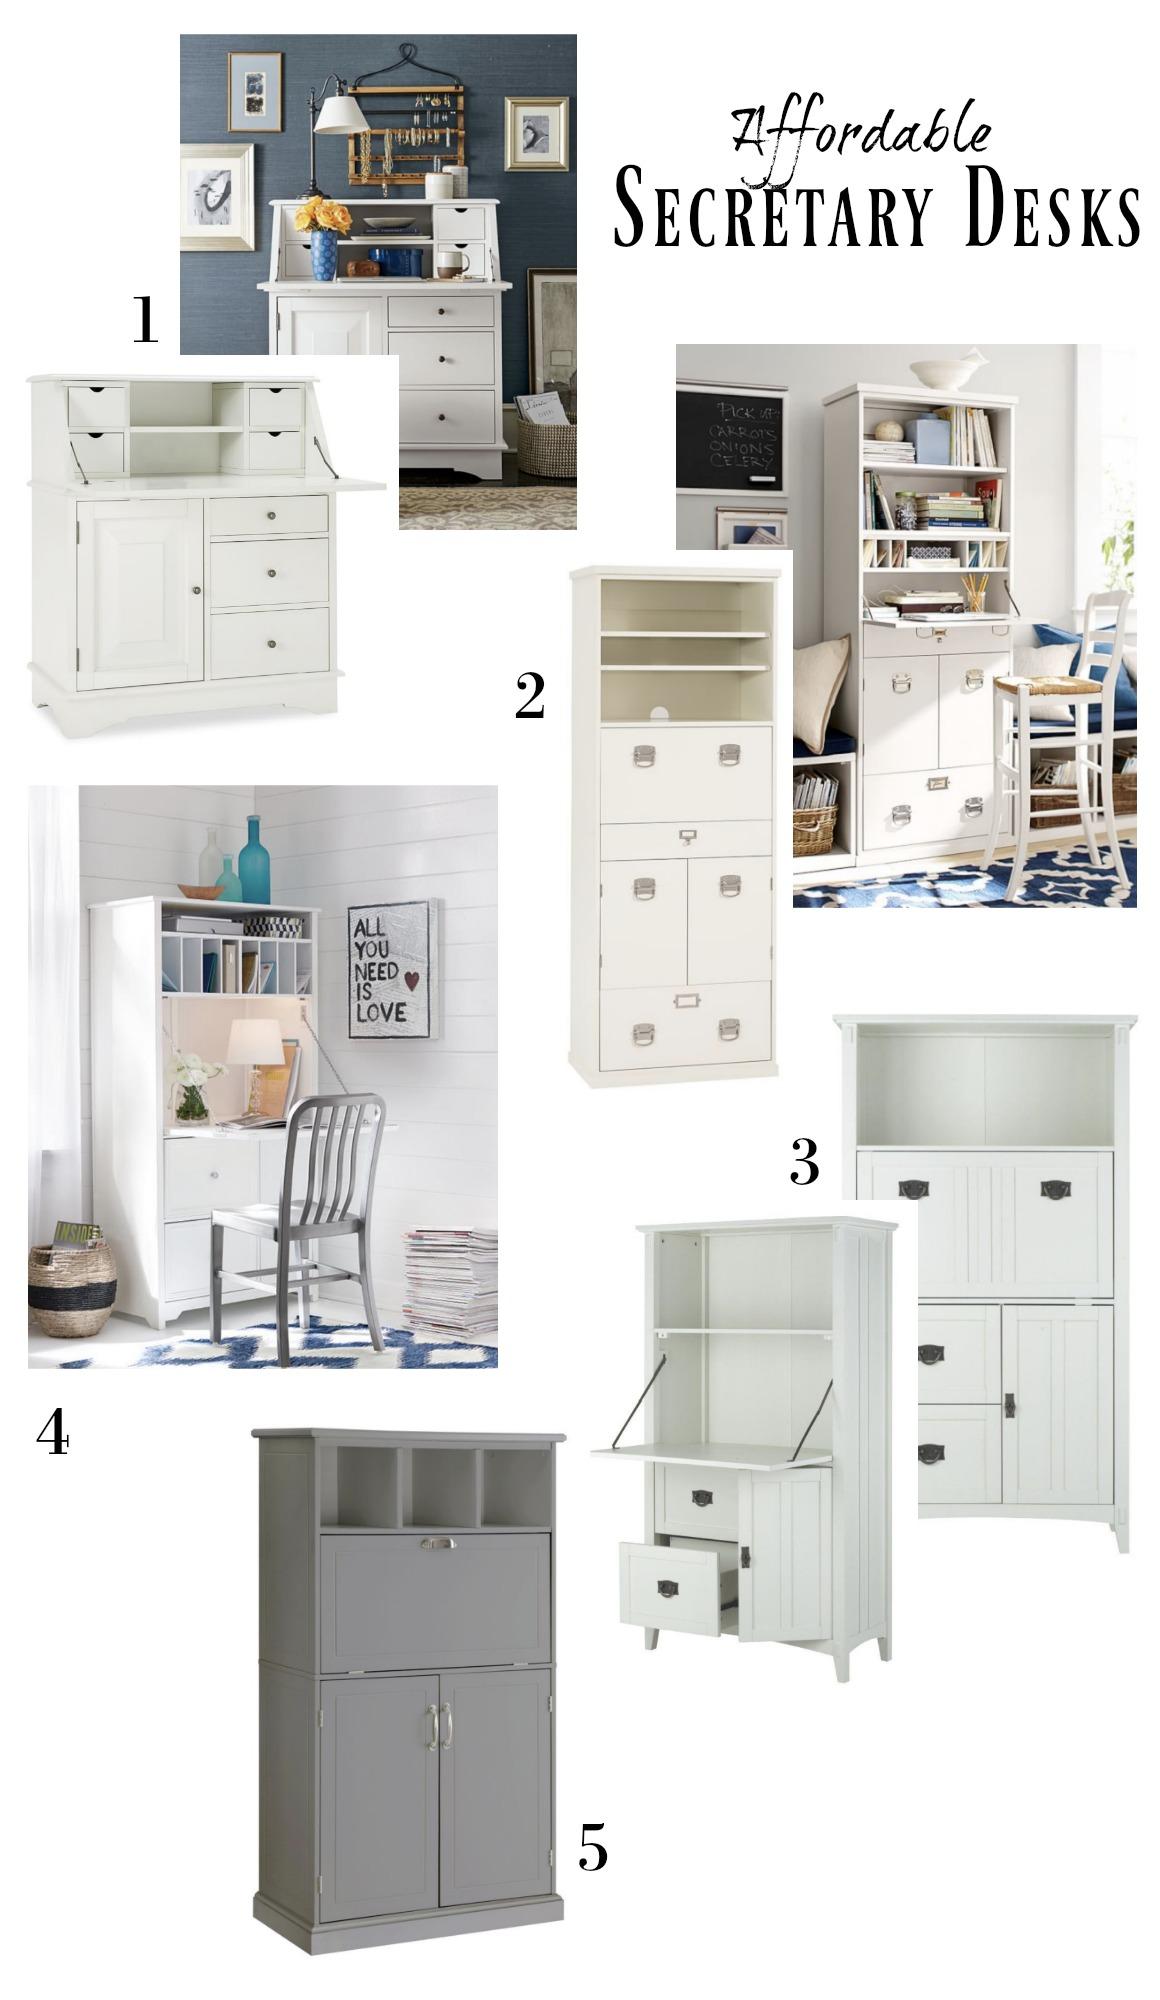 Secretary Desks- Afforable Desk Options for Small Spaces